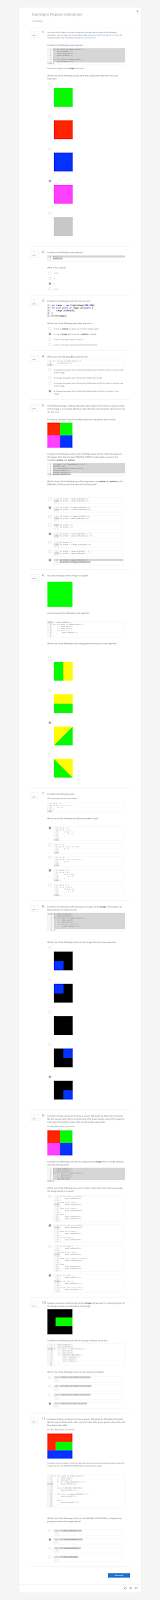 Coursera Quiz Answers